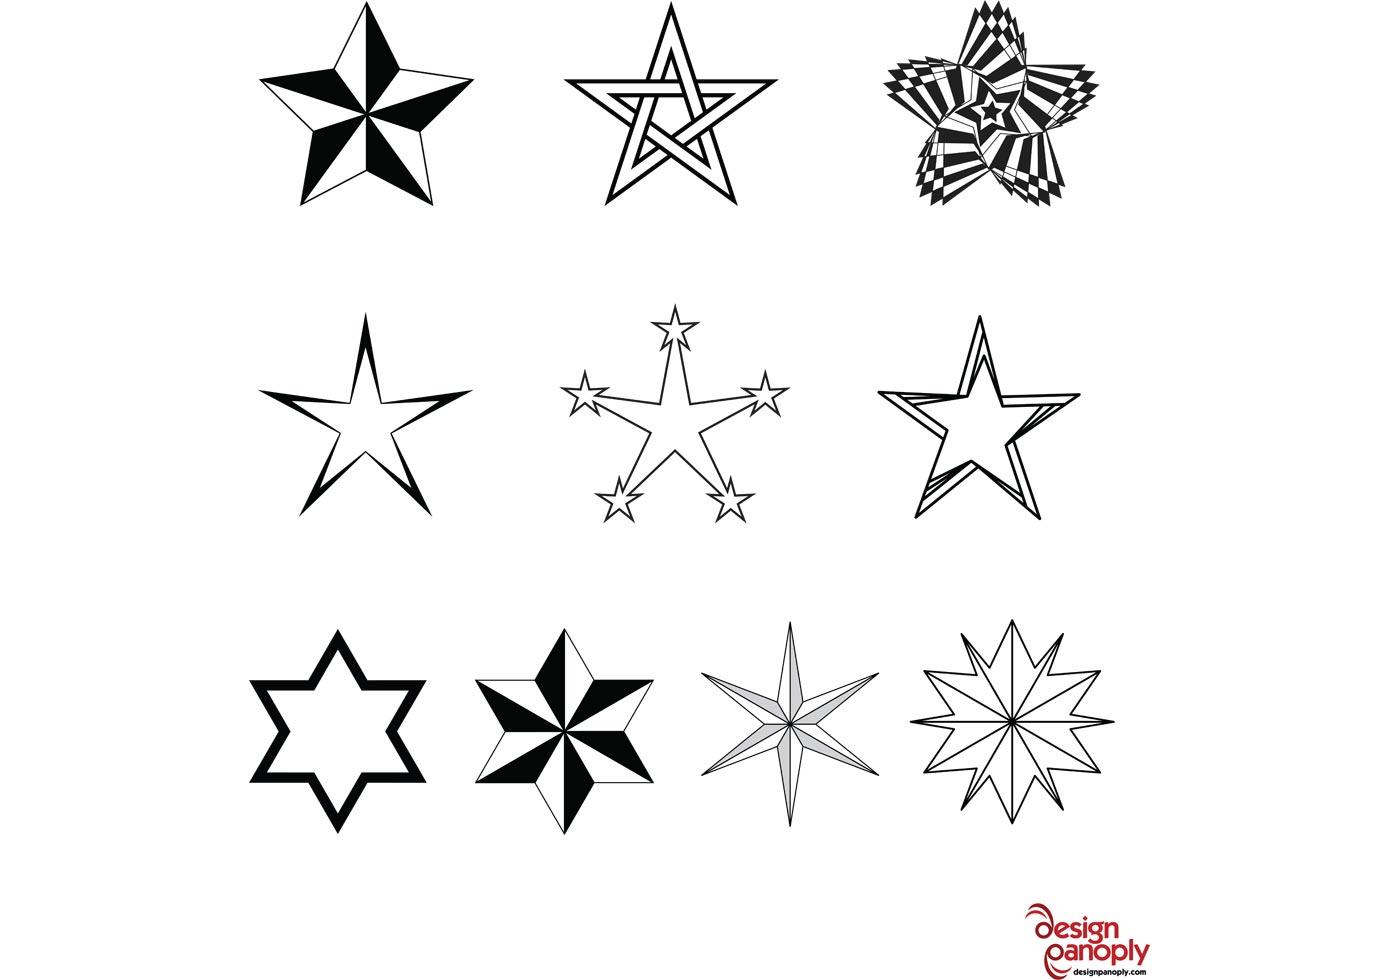 Black Dot Wallpaper Free Vector Stars Pack Download Free Vector Art Stock